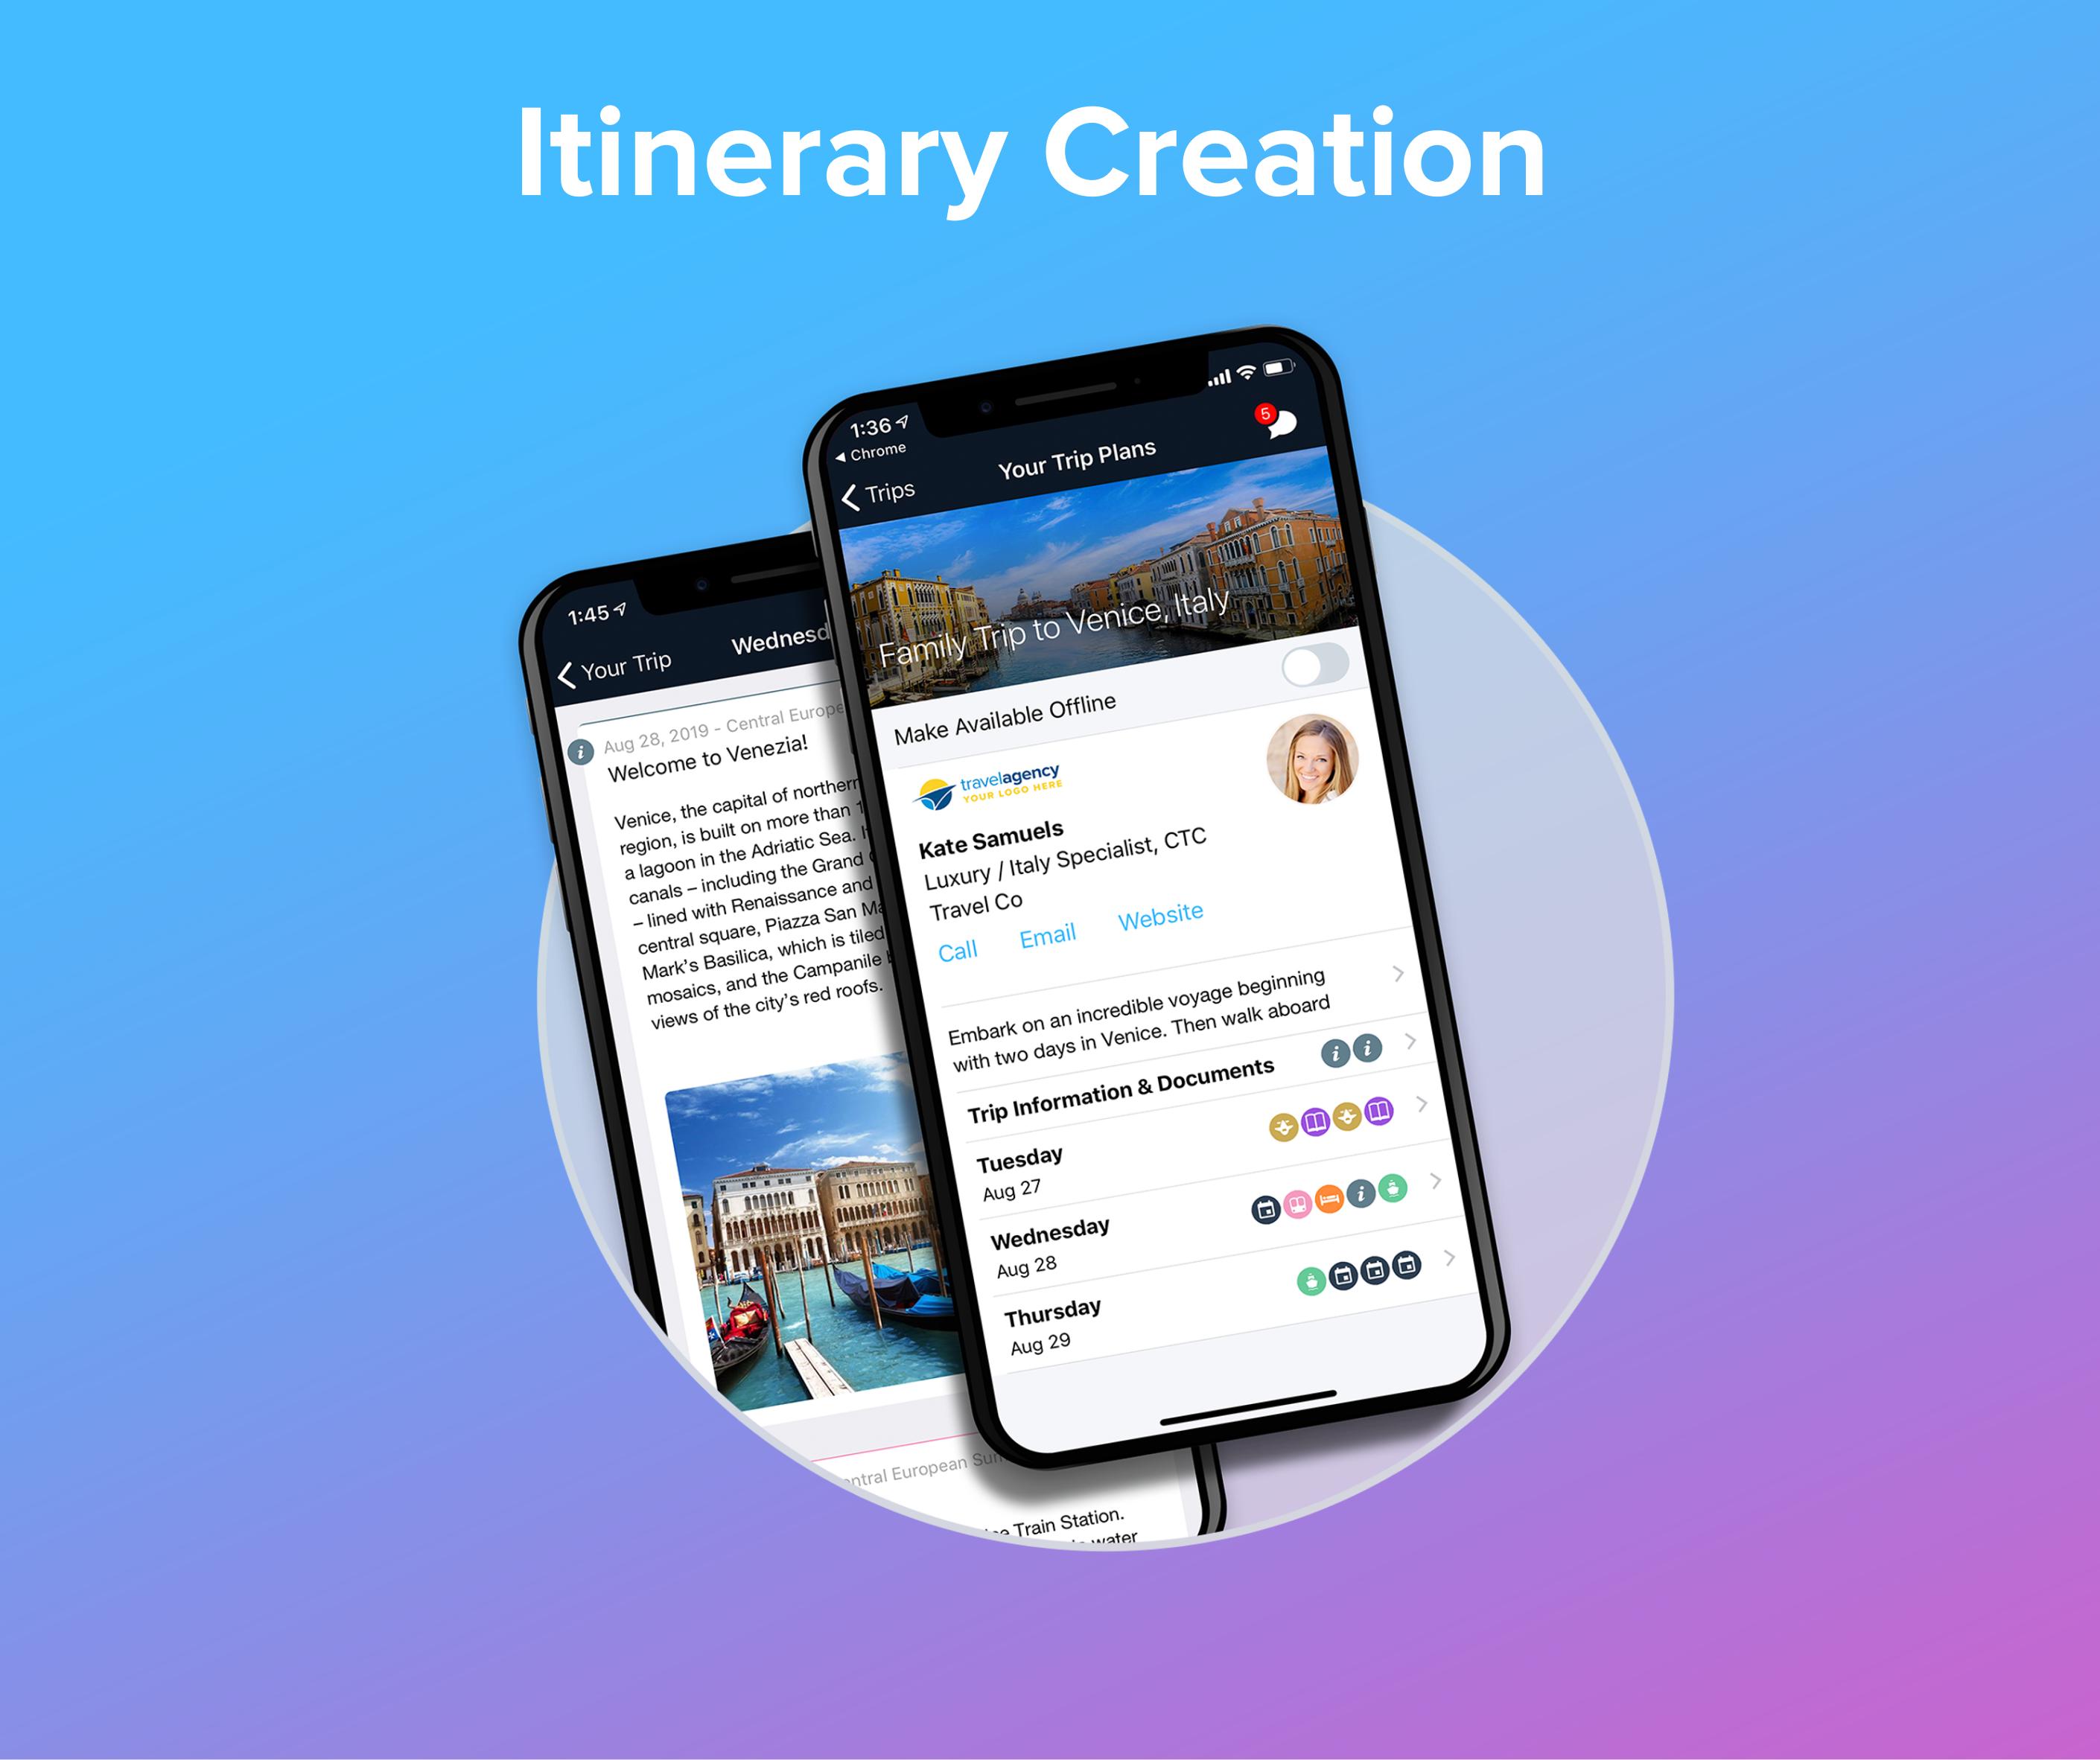 Itinerary Creation